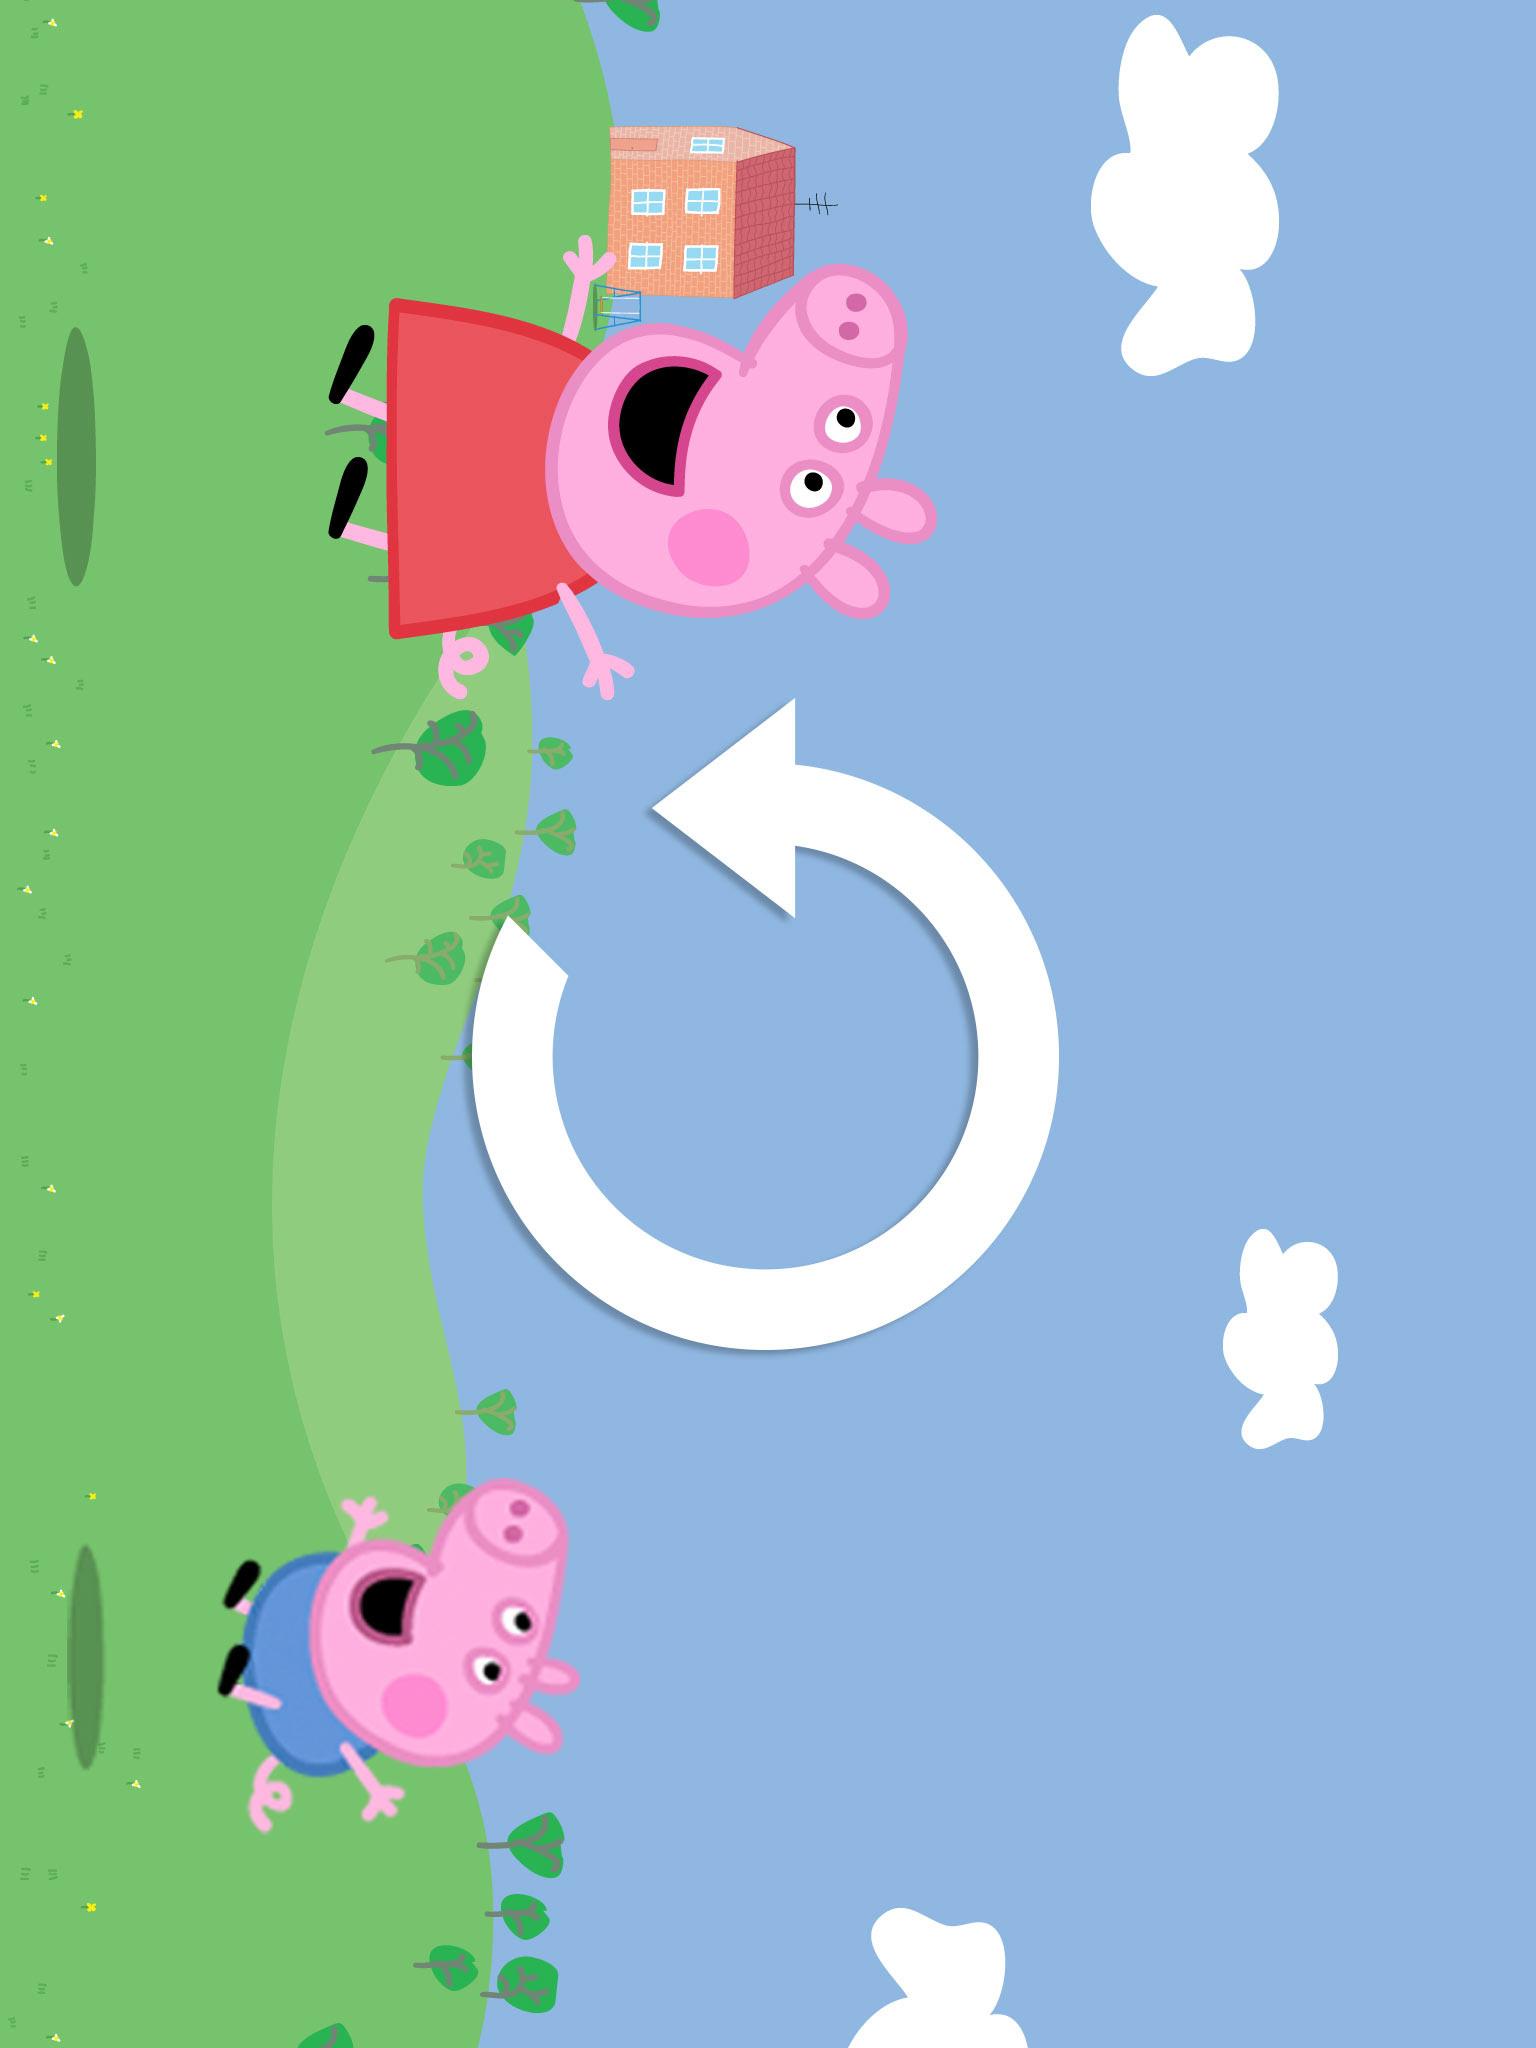 Peppa Pig Horror Game Online Play Free